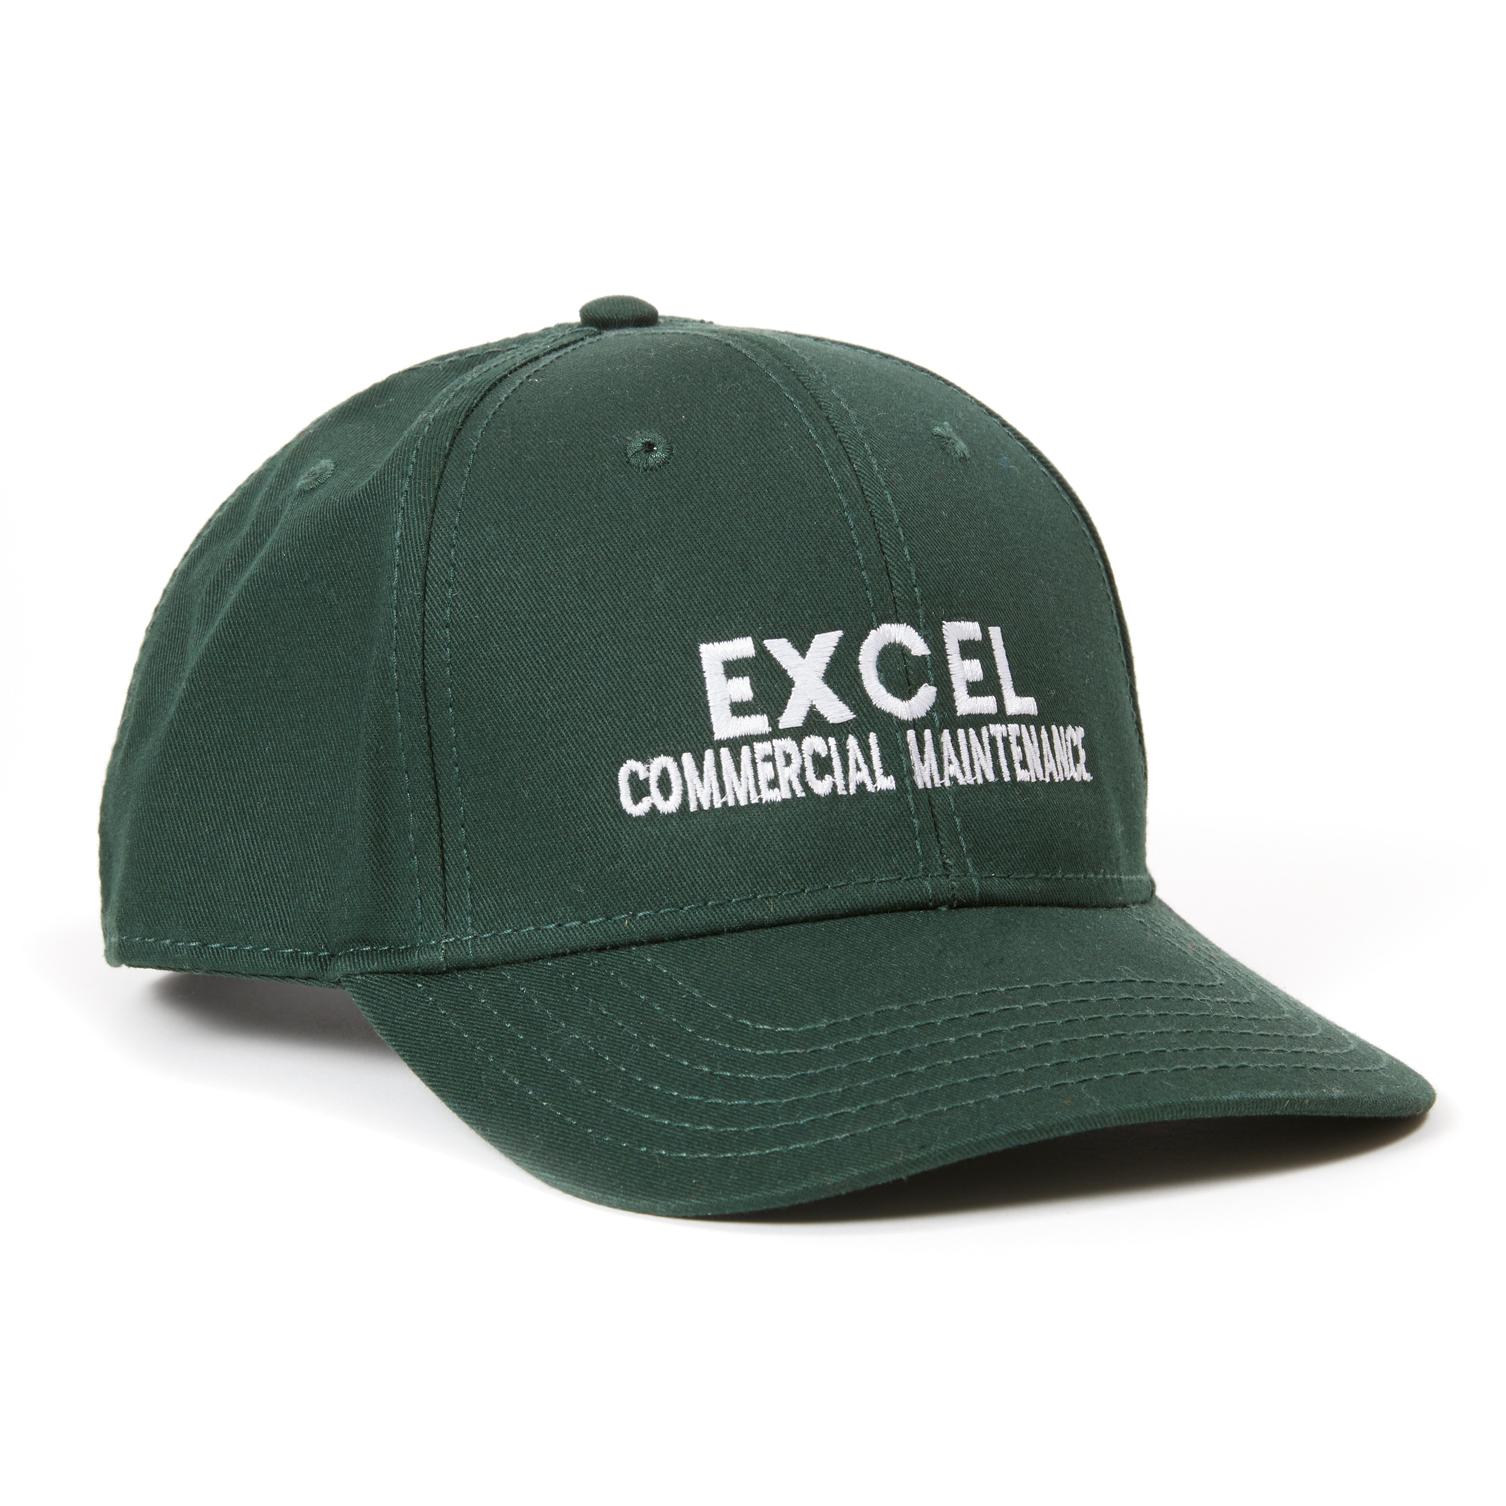 excel-commercial-maintenance-hat